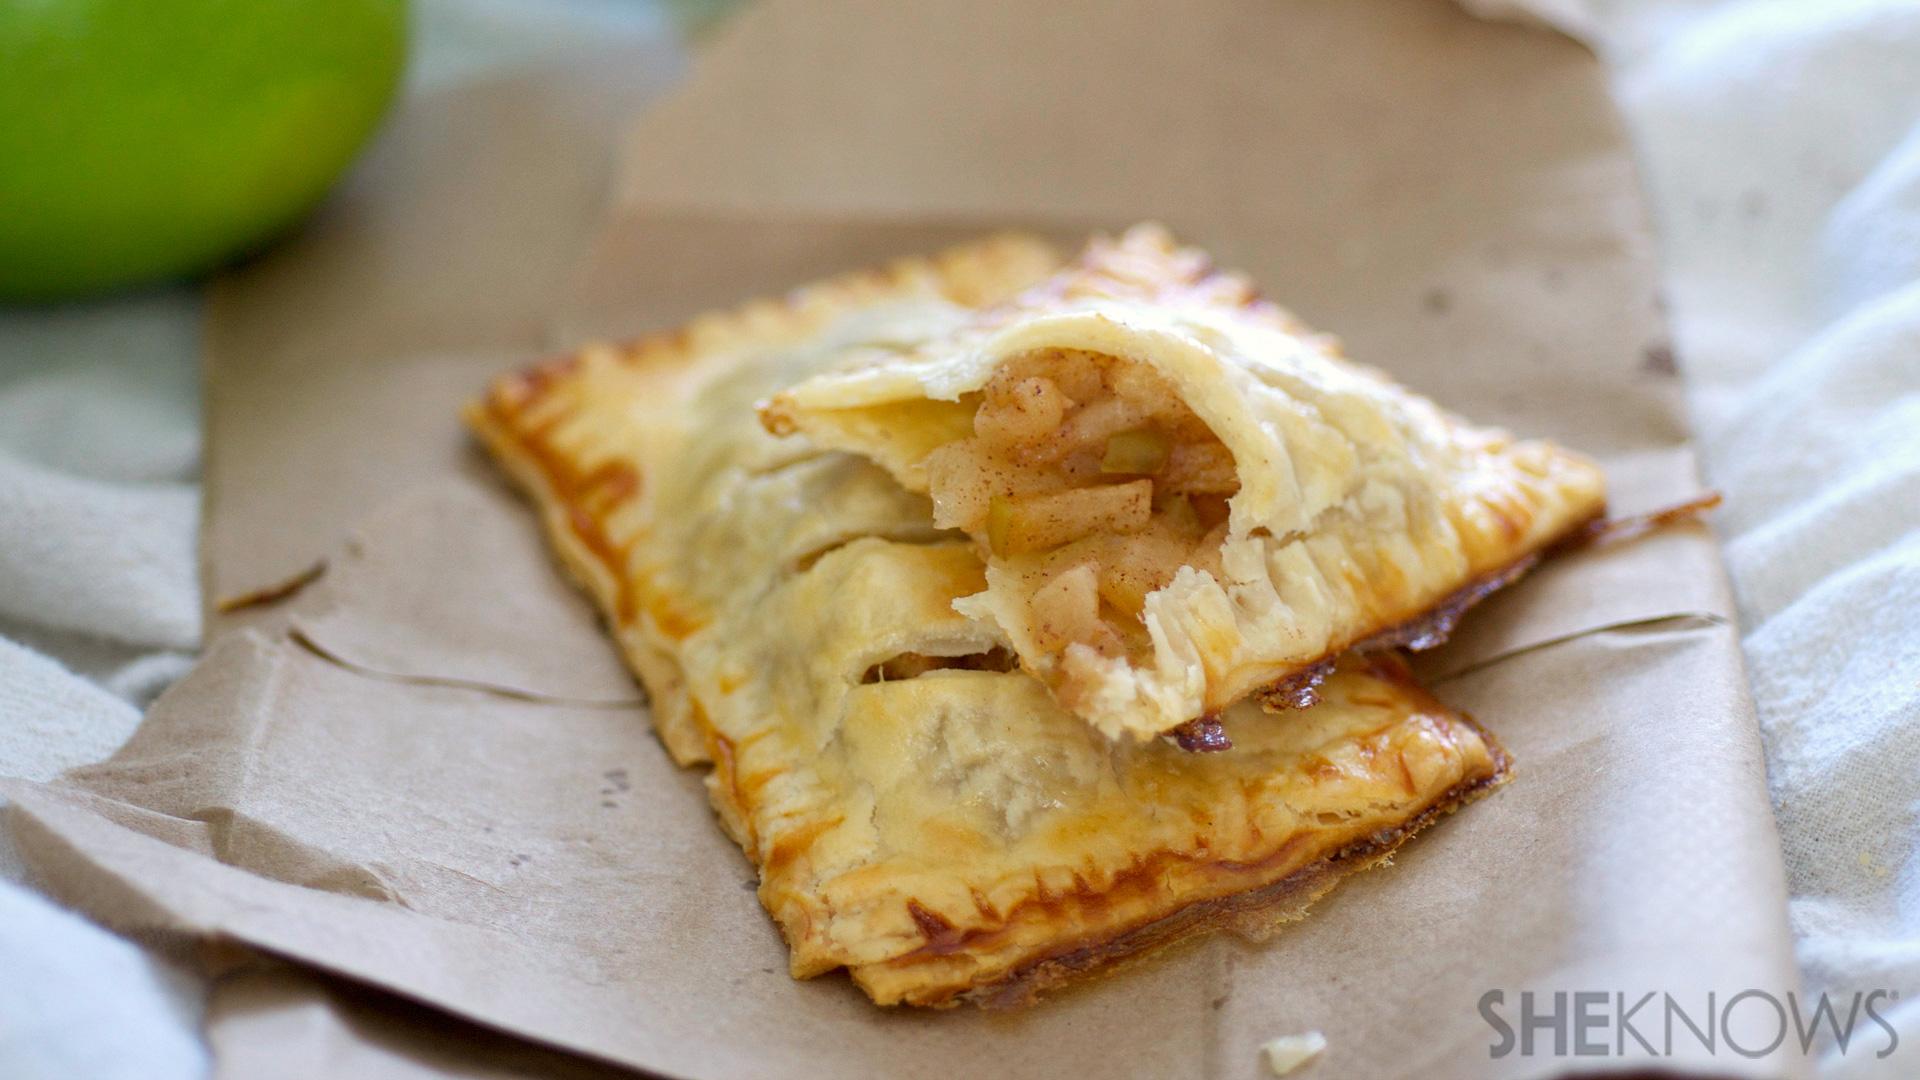 Apple Pie Turnover Mcdonald's Baked Apple Pie